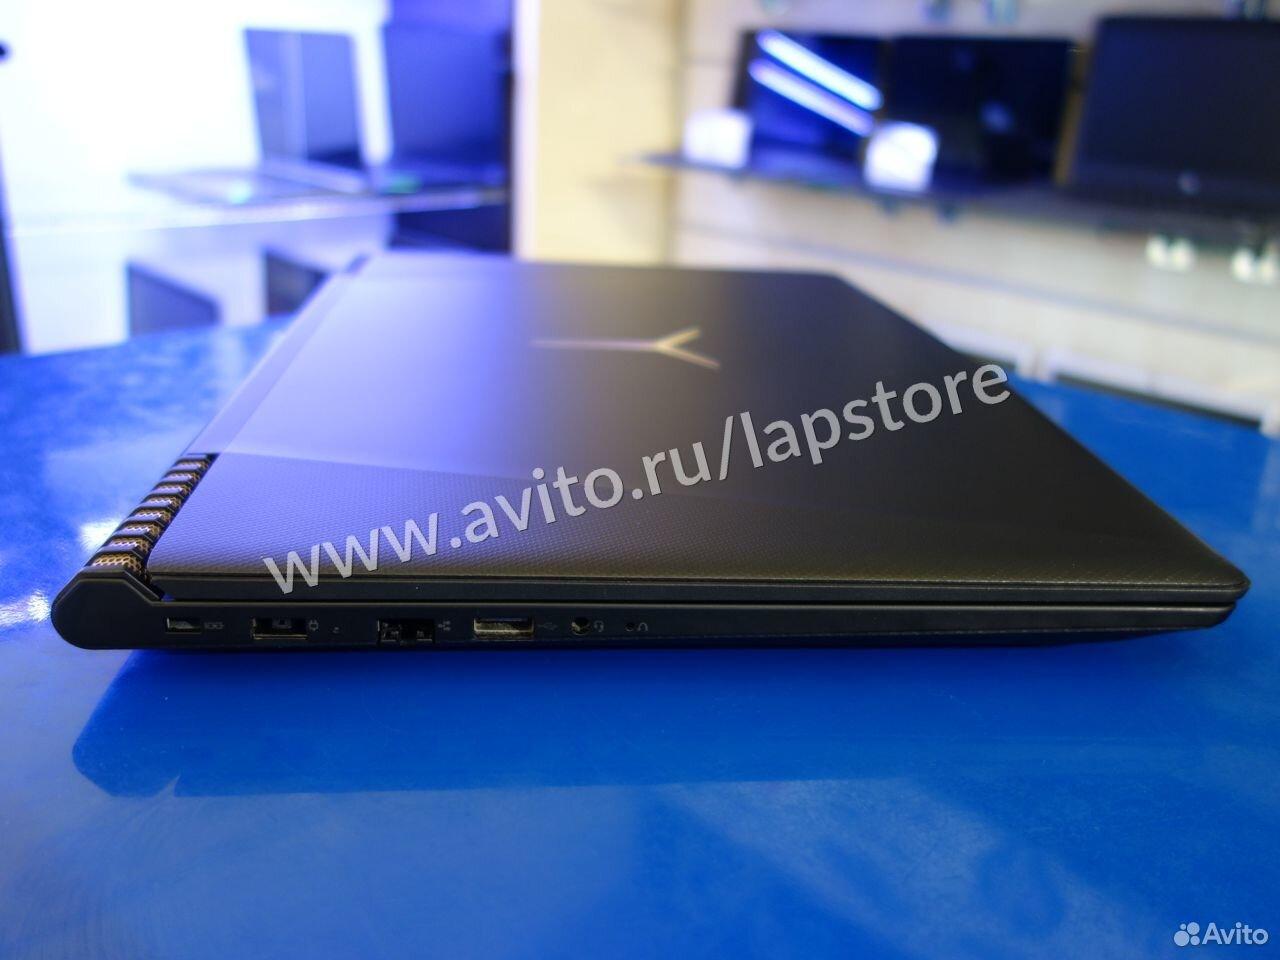 Ноутбук Lenovo Y520 i7-7700HQ/16GB/256+1T/GTX1050  84012422018 купить 7